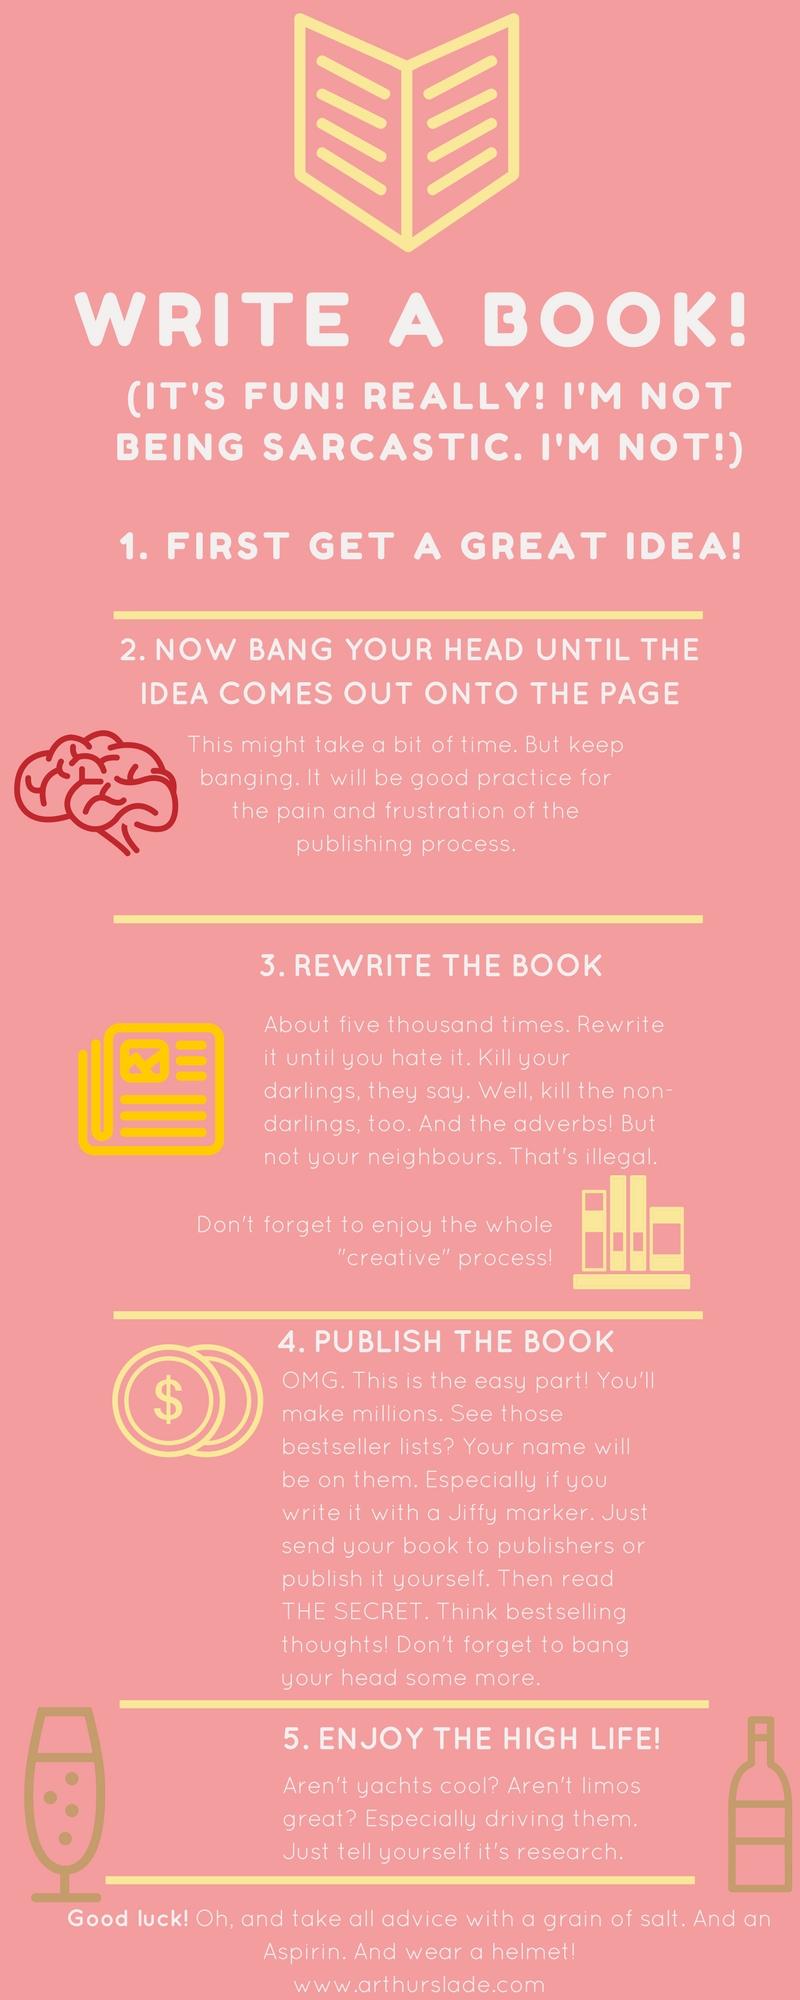 Write a book!.jpg